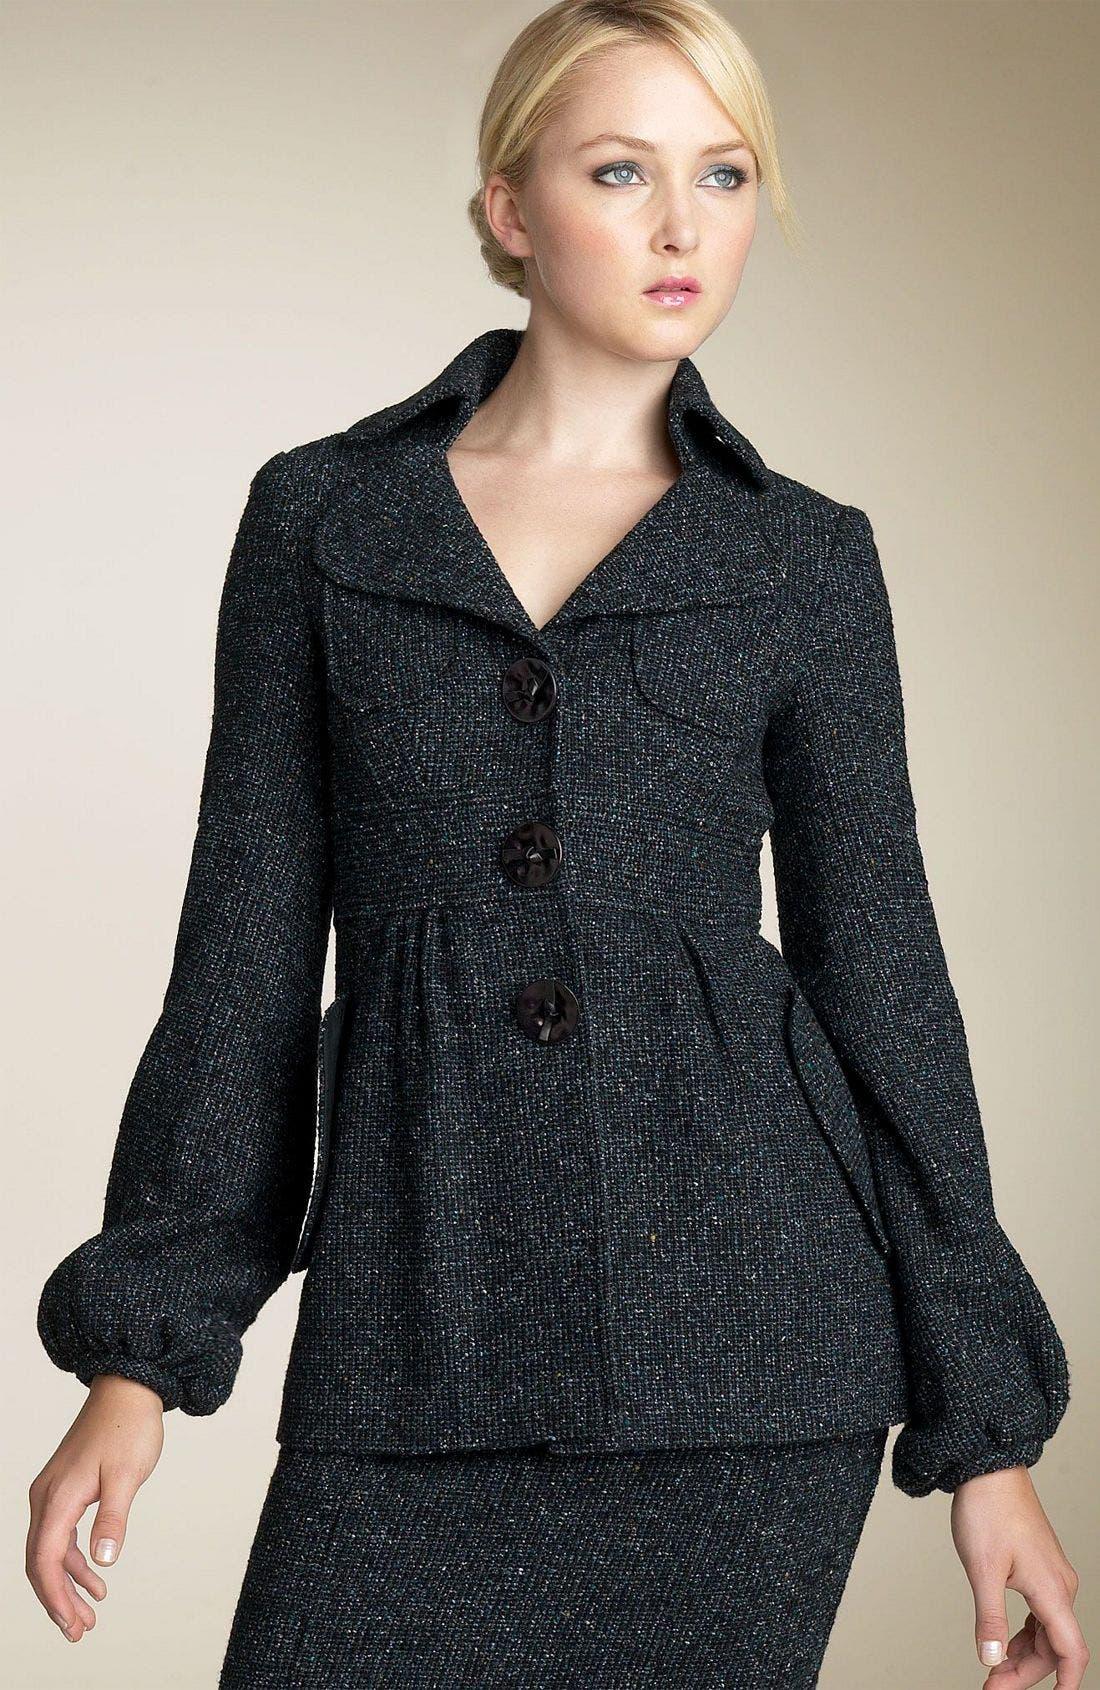 Main Image - Nanette Lepore 'Palette' Jacket